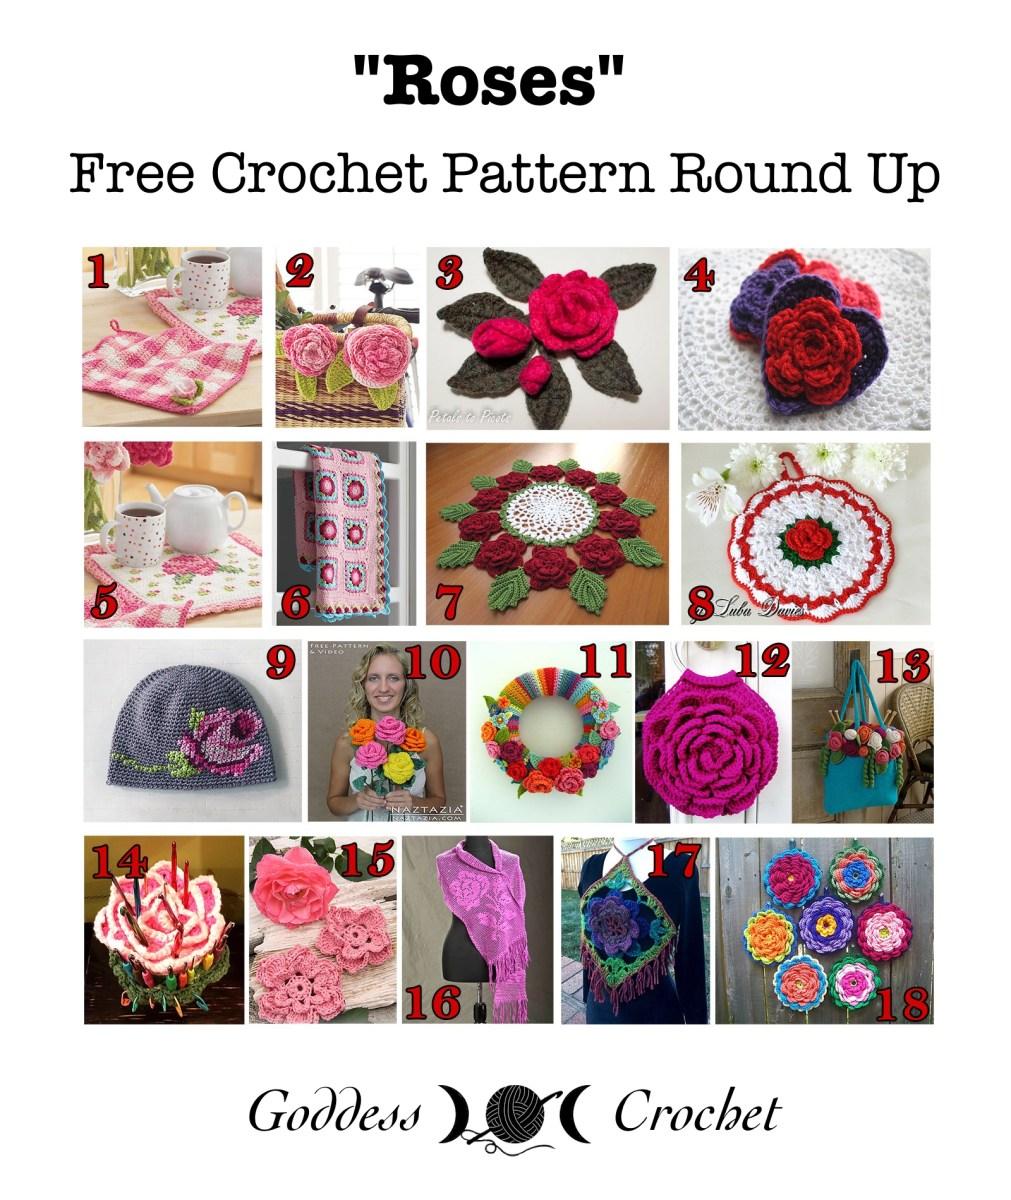 Roses Free Crochet Pattern Round Up Goddess Crochet